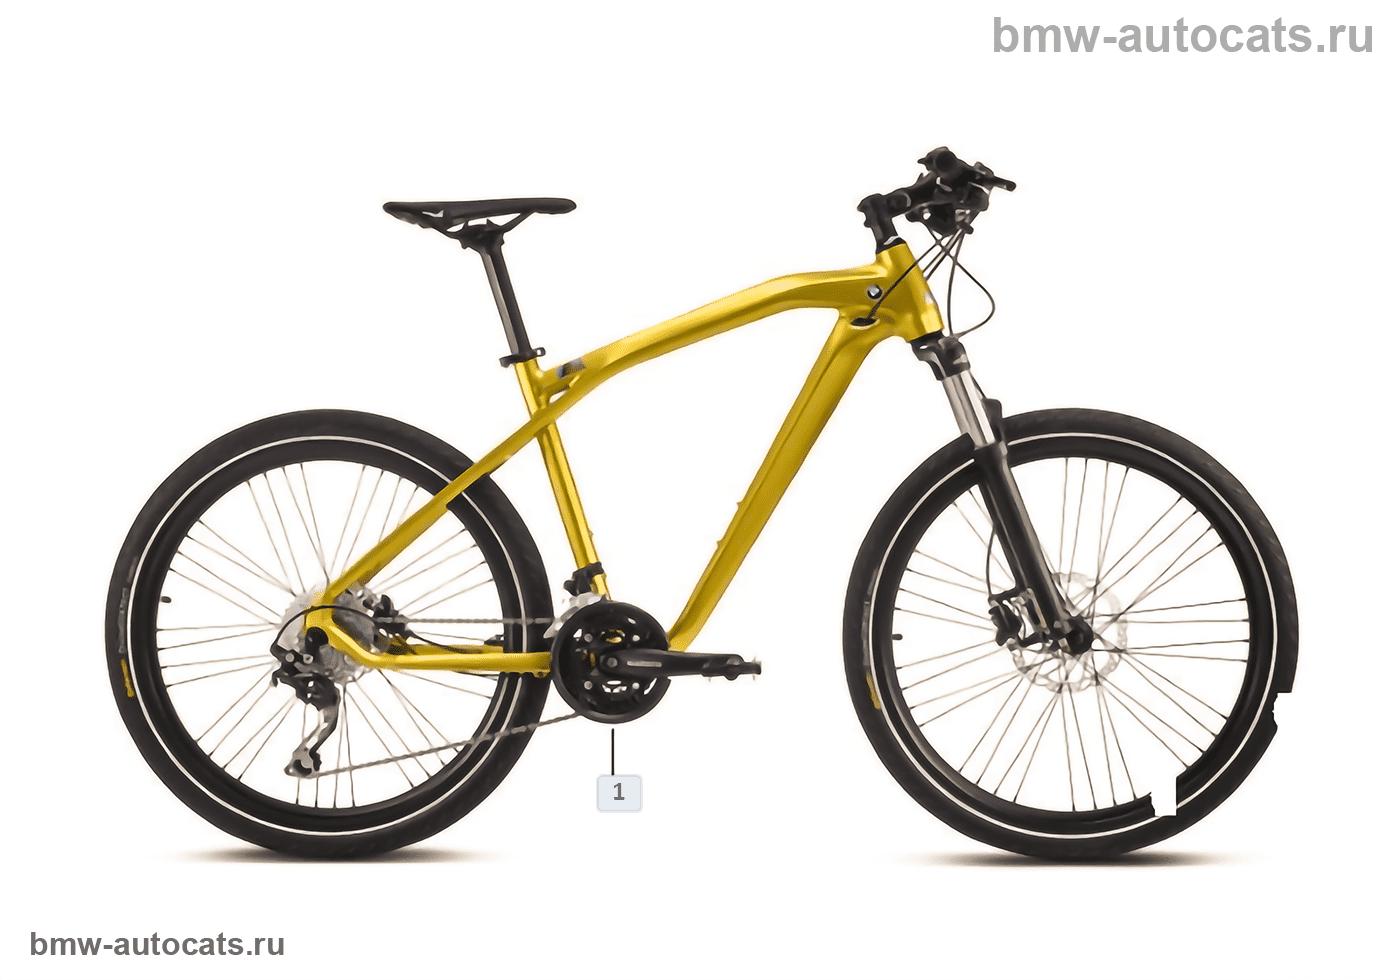 BMW Bikes — Cruise M-Bike Austin Yellow